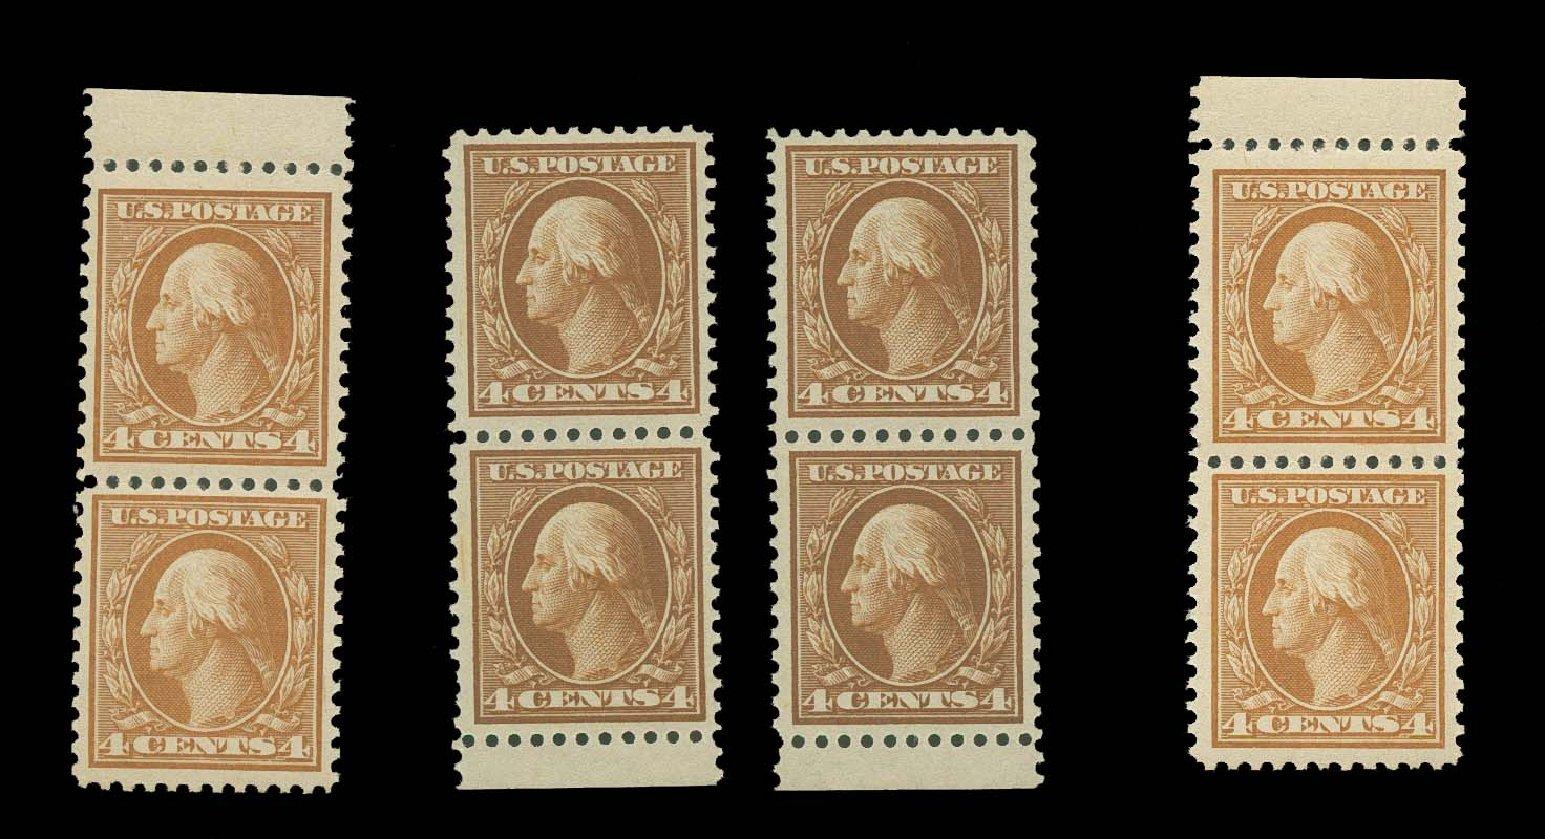 Prices of US Stamp Scott Catalog 503: 4c 1917 Washington Perf 11. H.R. Harmer, Oct 2014, Sale 3006, Lot 1383